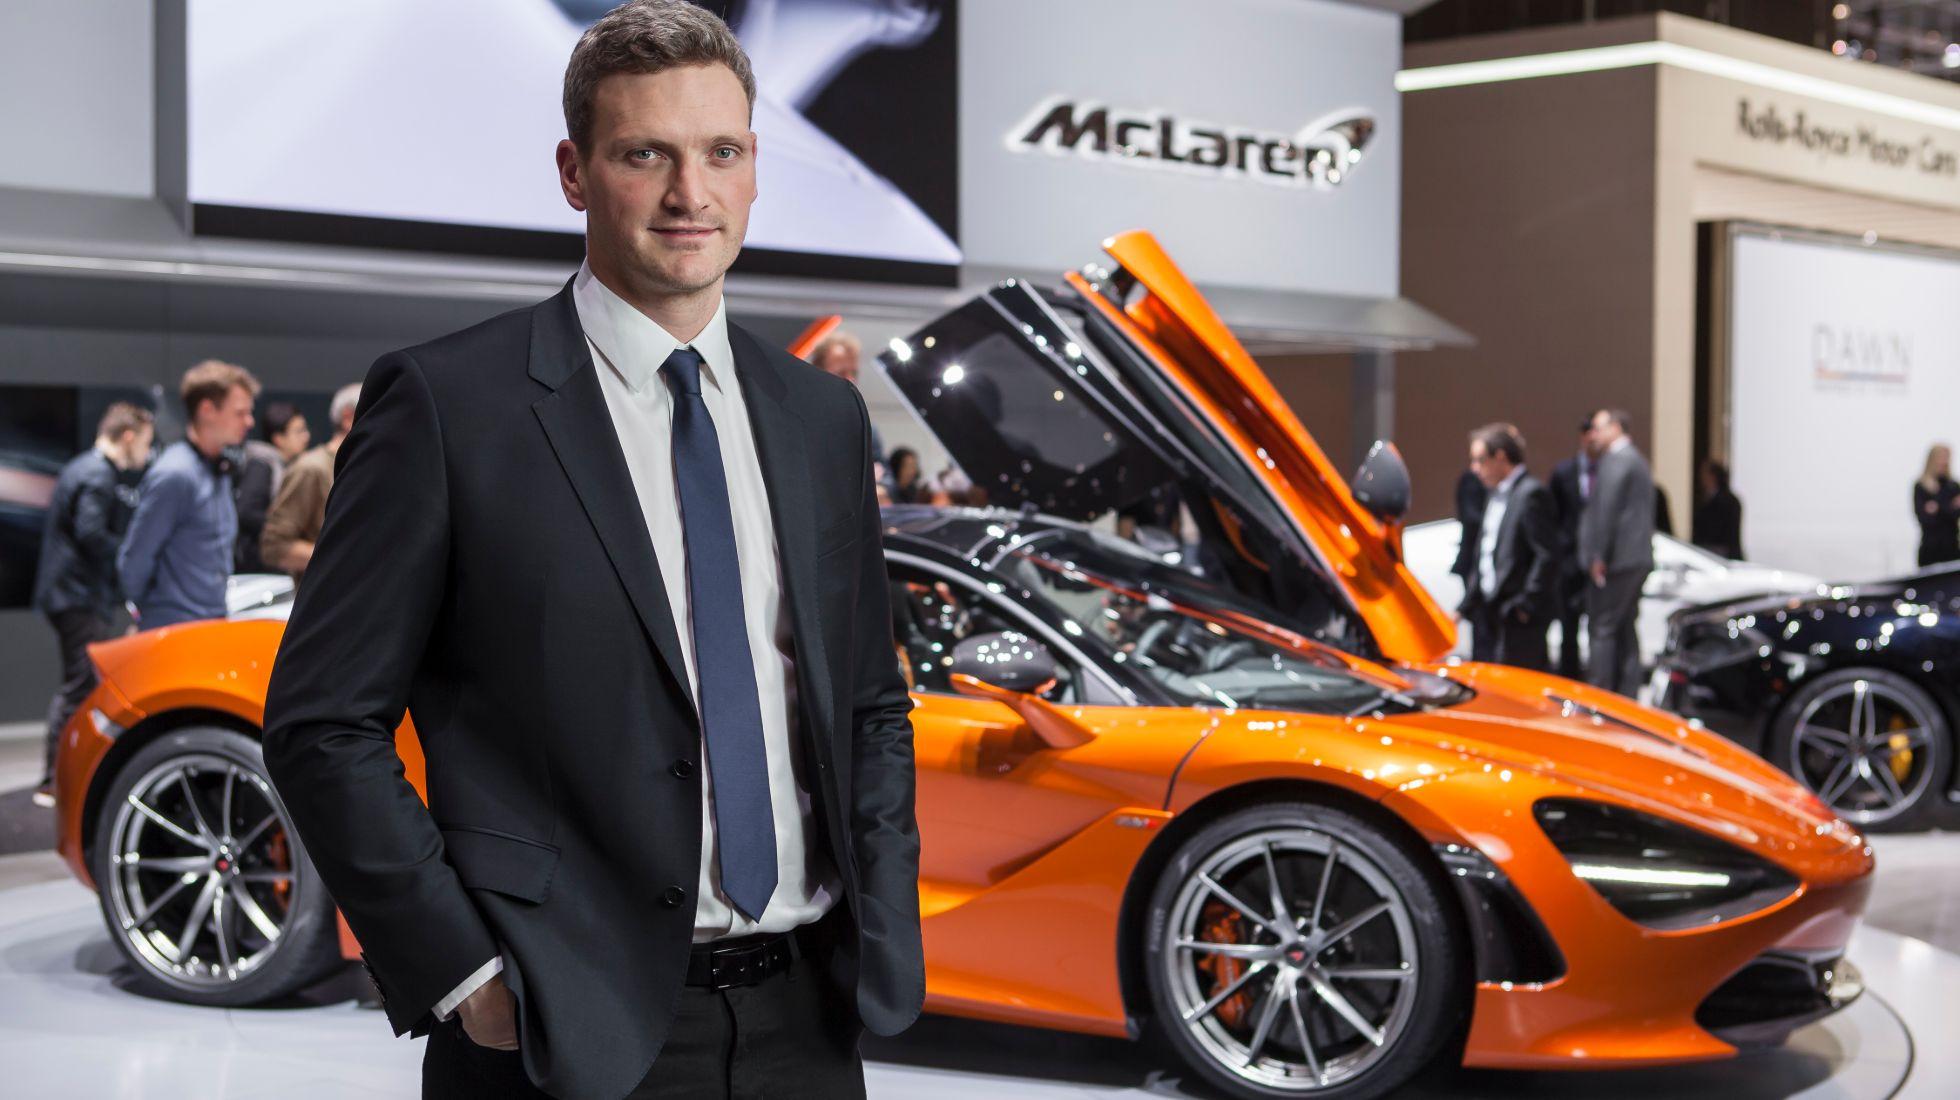 Meet the man responsible for the McLaren Automotive design portfolio